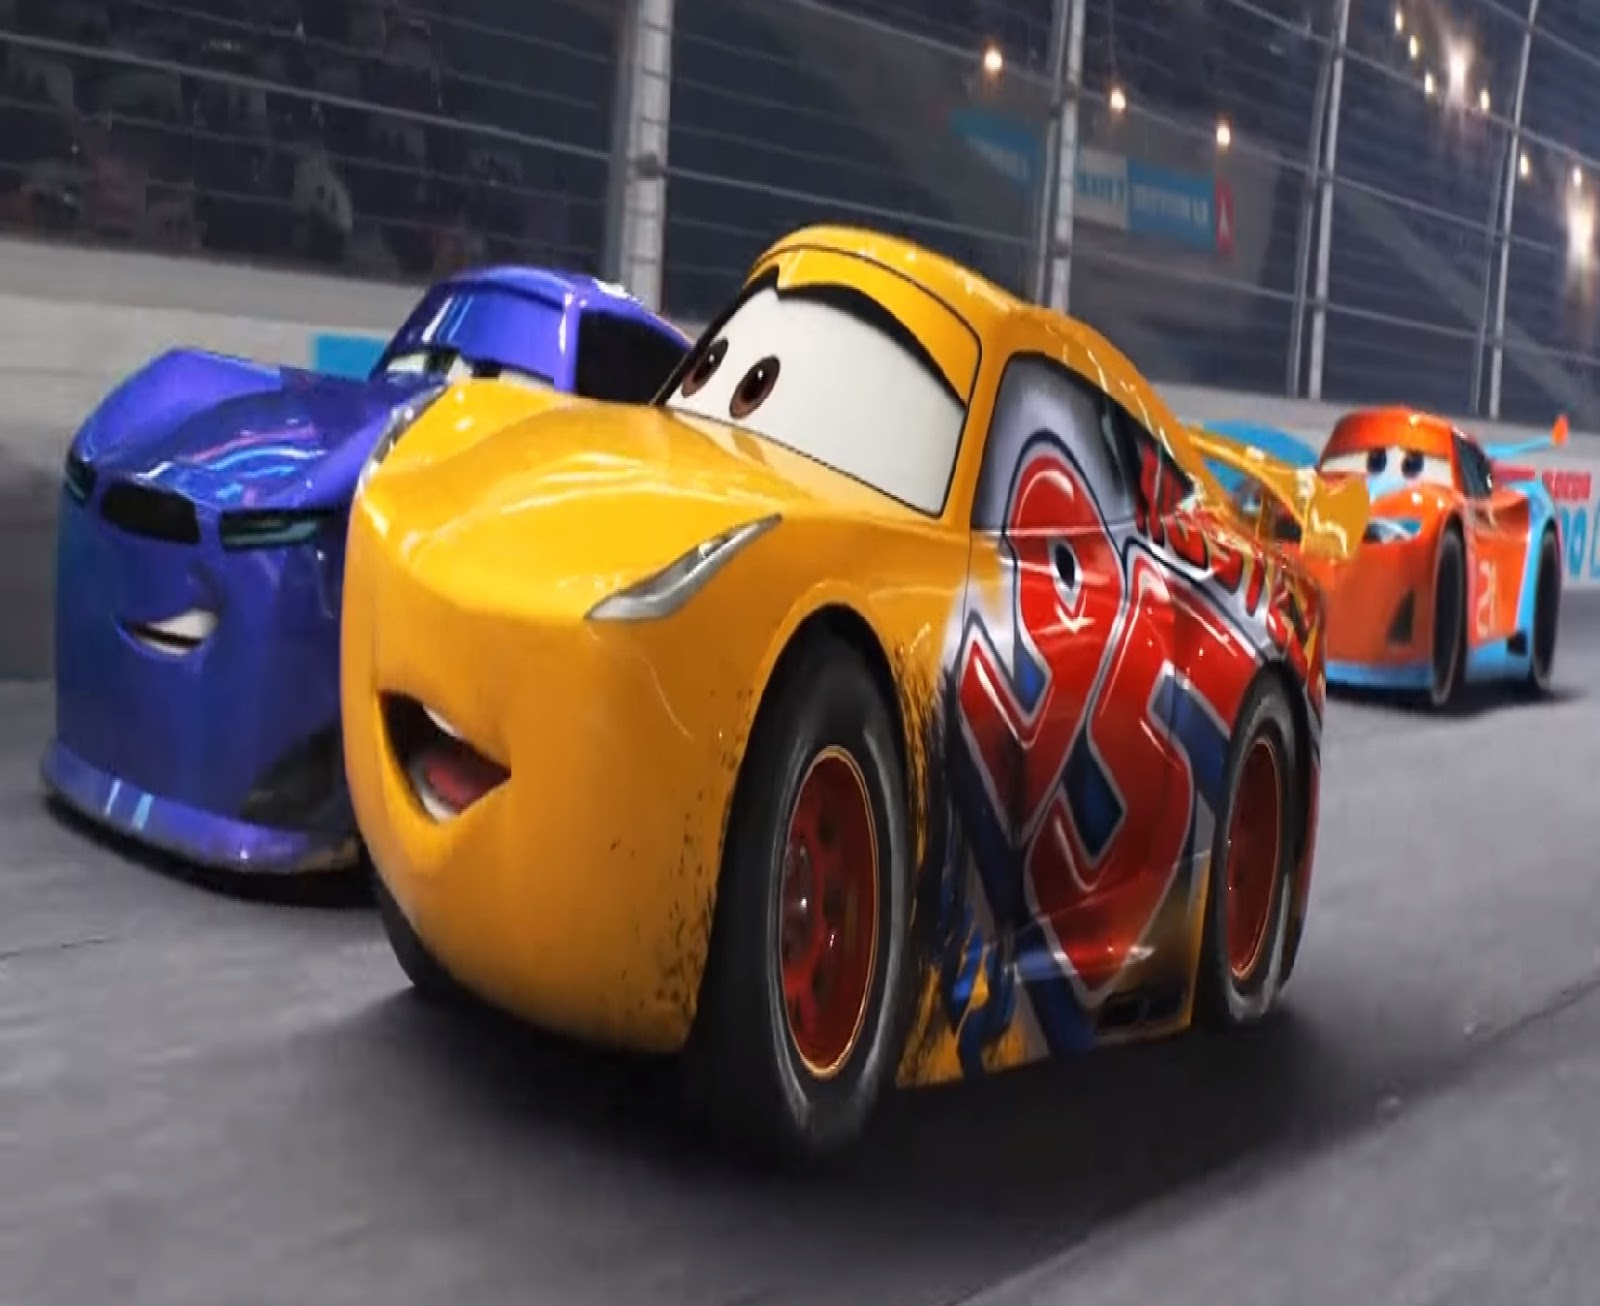 cars cruz pixar jackson ramirez storm film random florida yellow wins race purple disney against neko speed